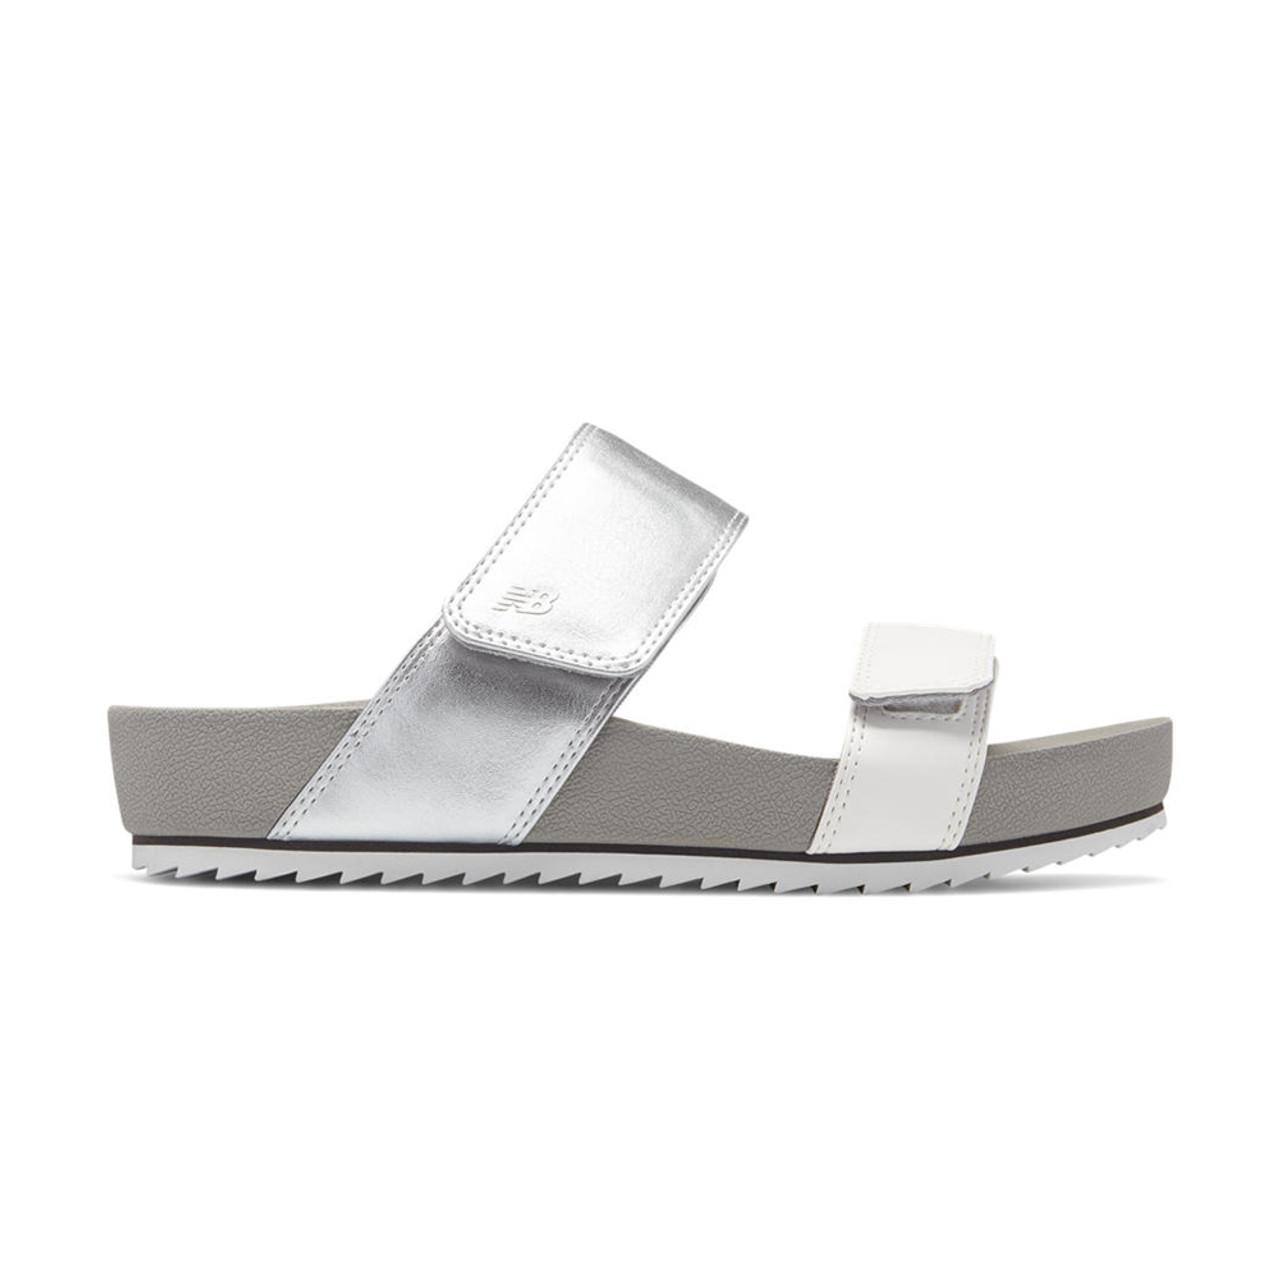 WR3100SL City Slide Sandal - Silver